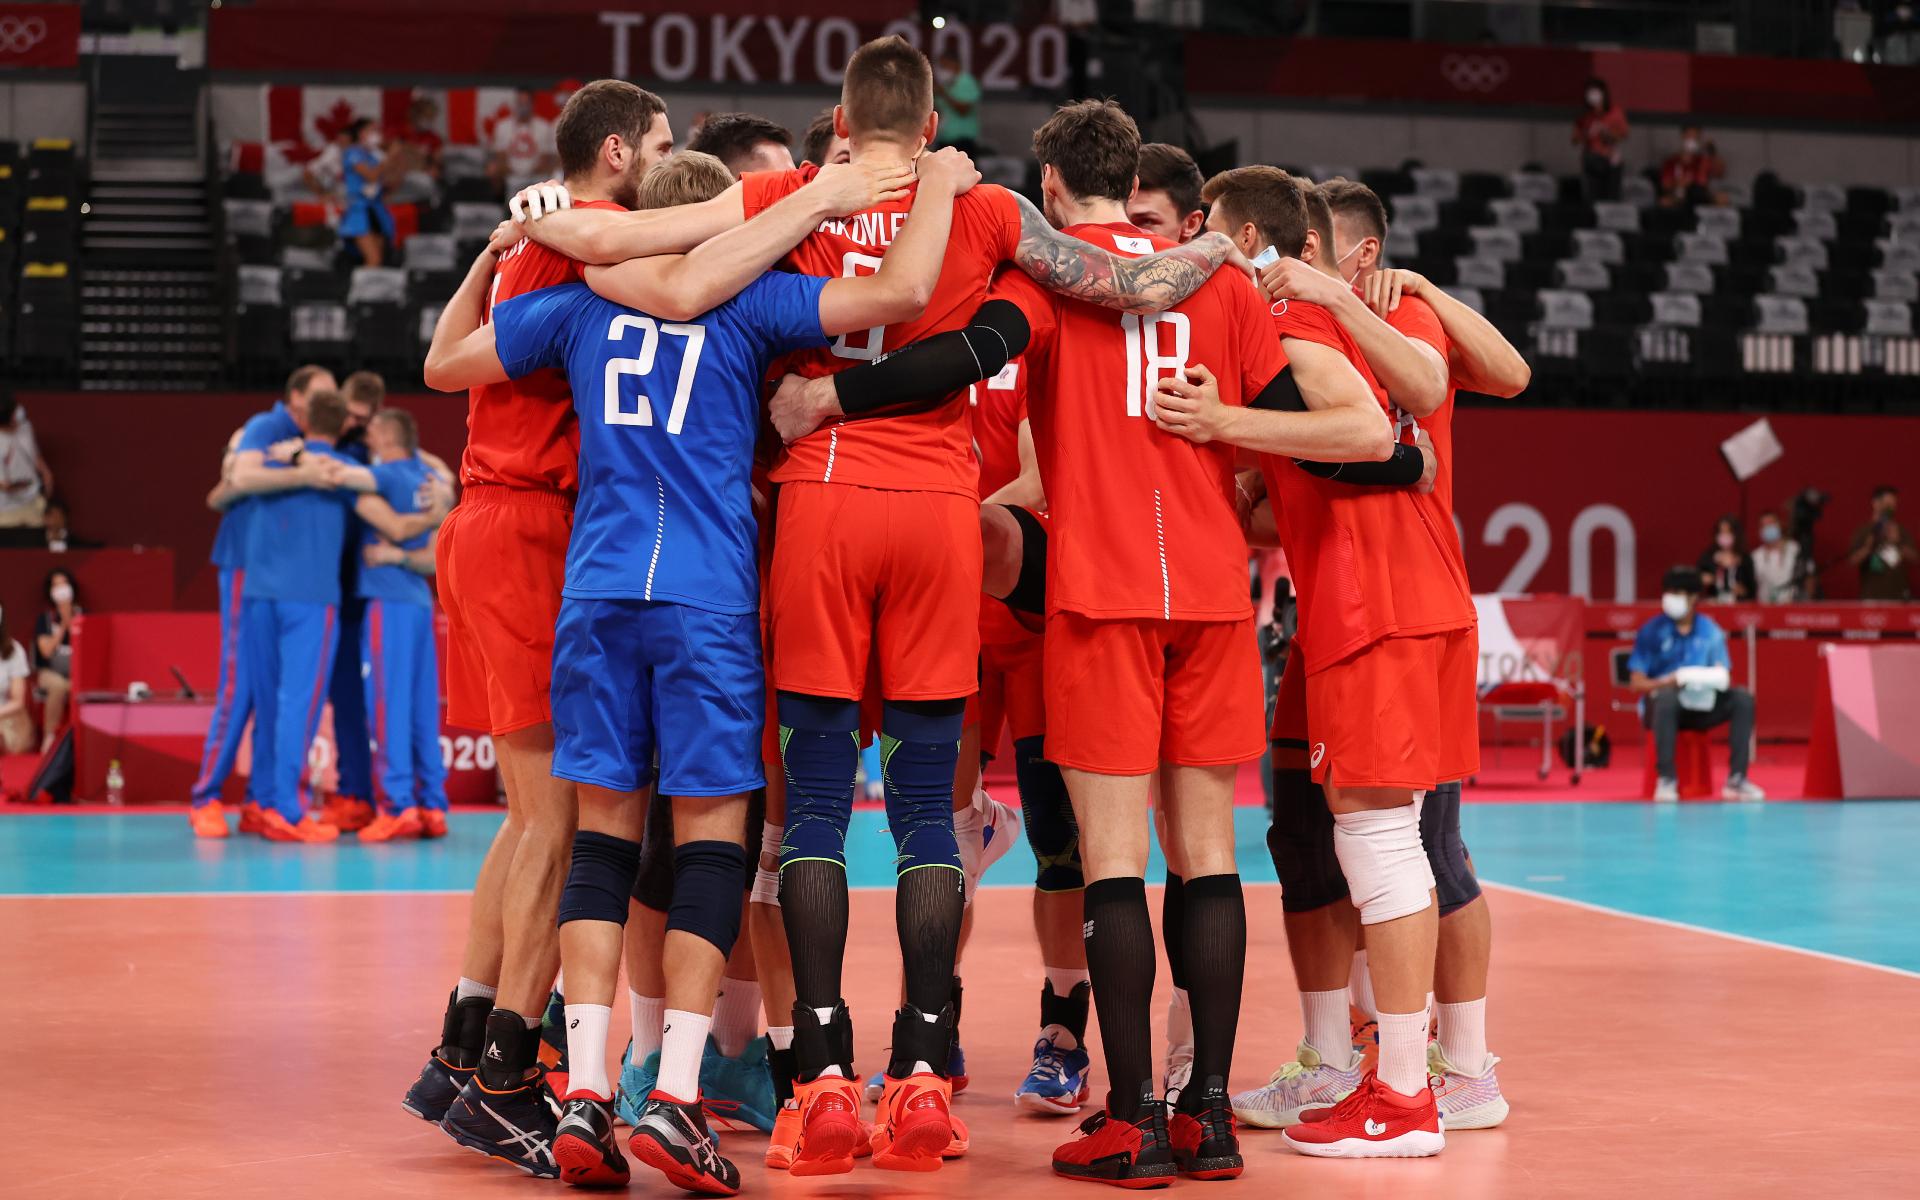 Фото: Мужская сборная России по волейболу  (Photo by Toru Hanai/Getty Images)